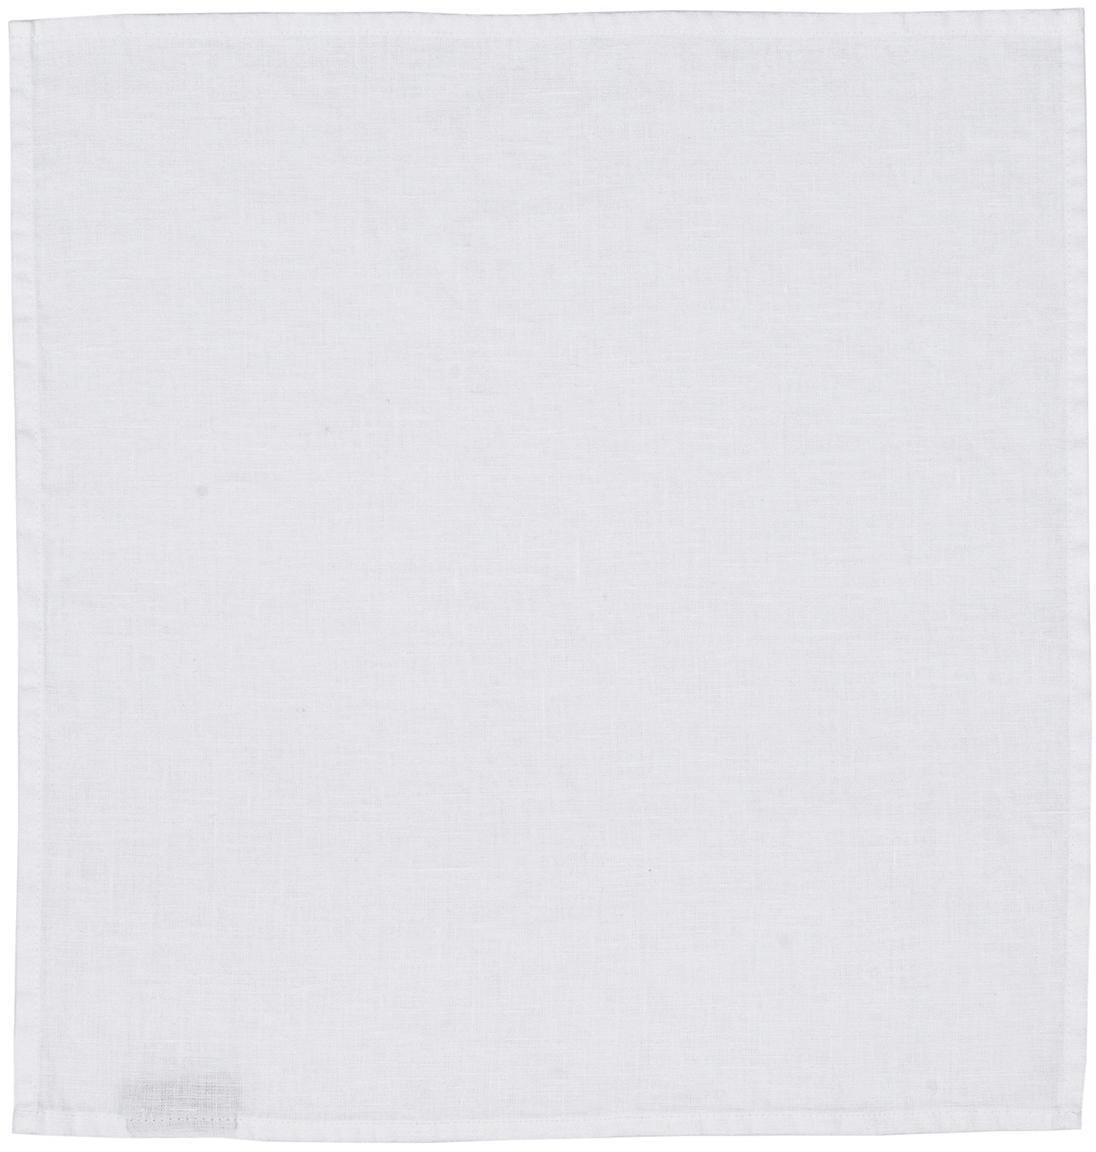 Servilletas de lino Ruta, 6uds., Blanco nieve, An 43 x L 43 cm